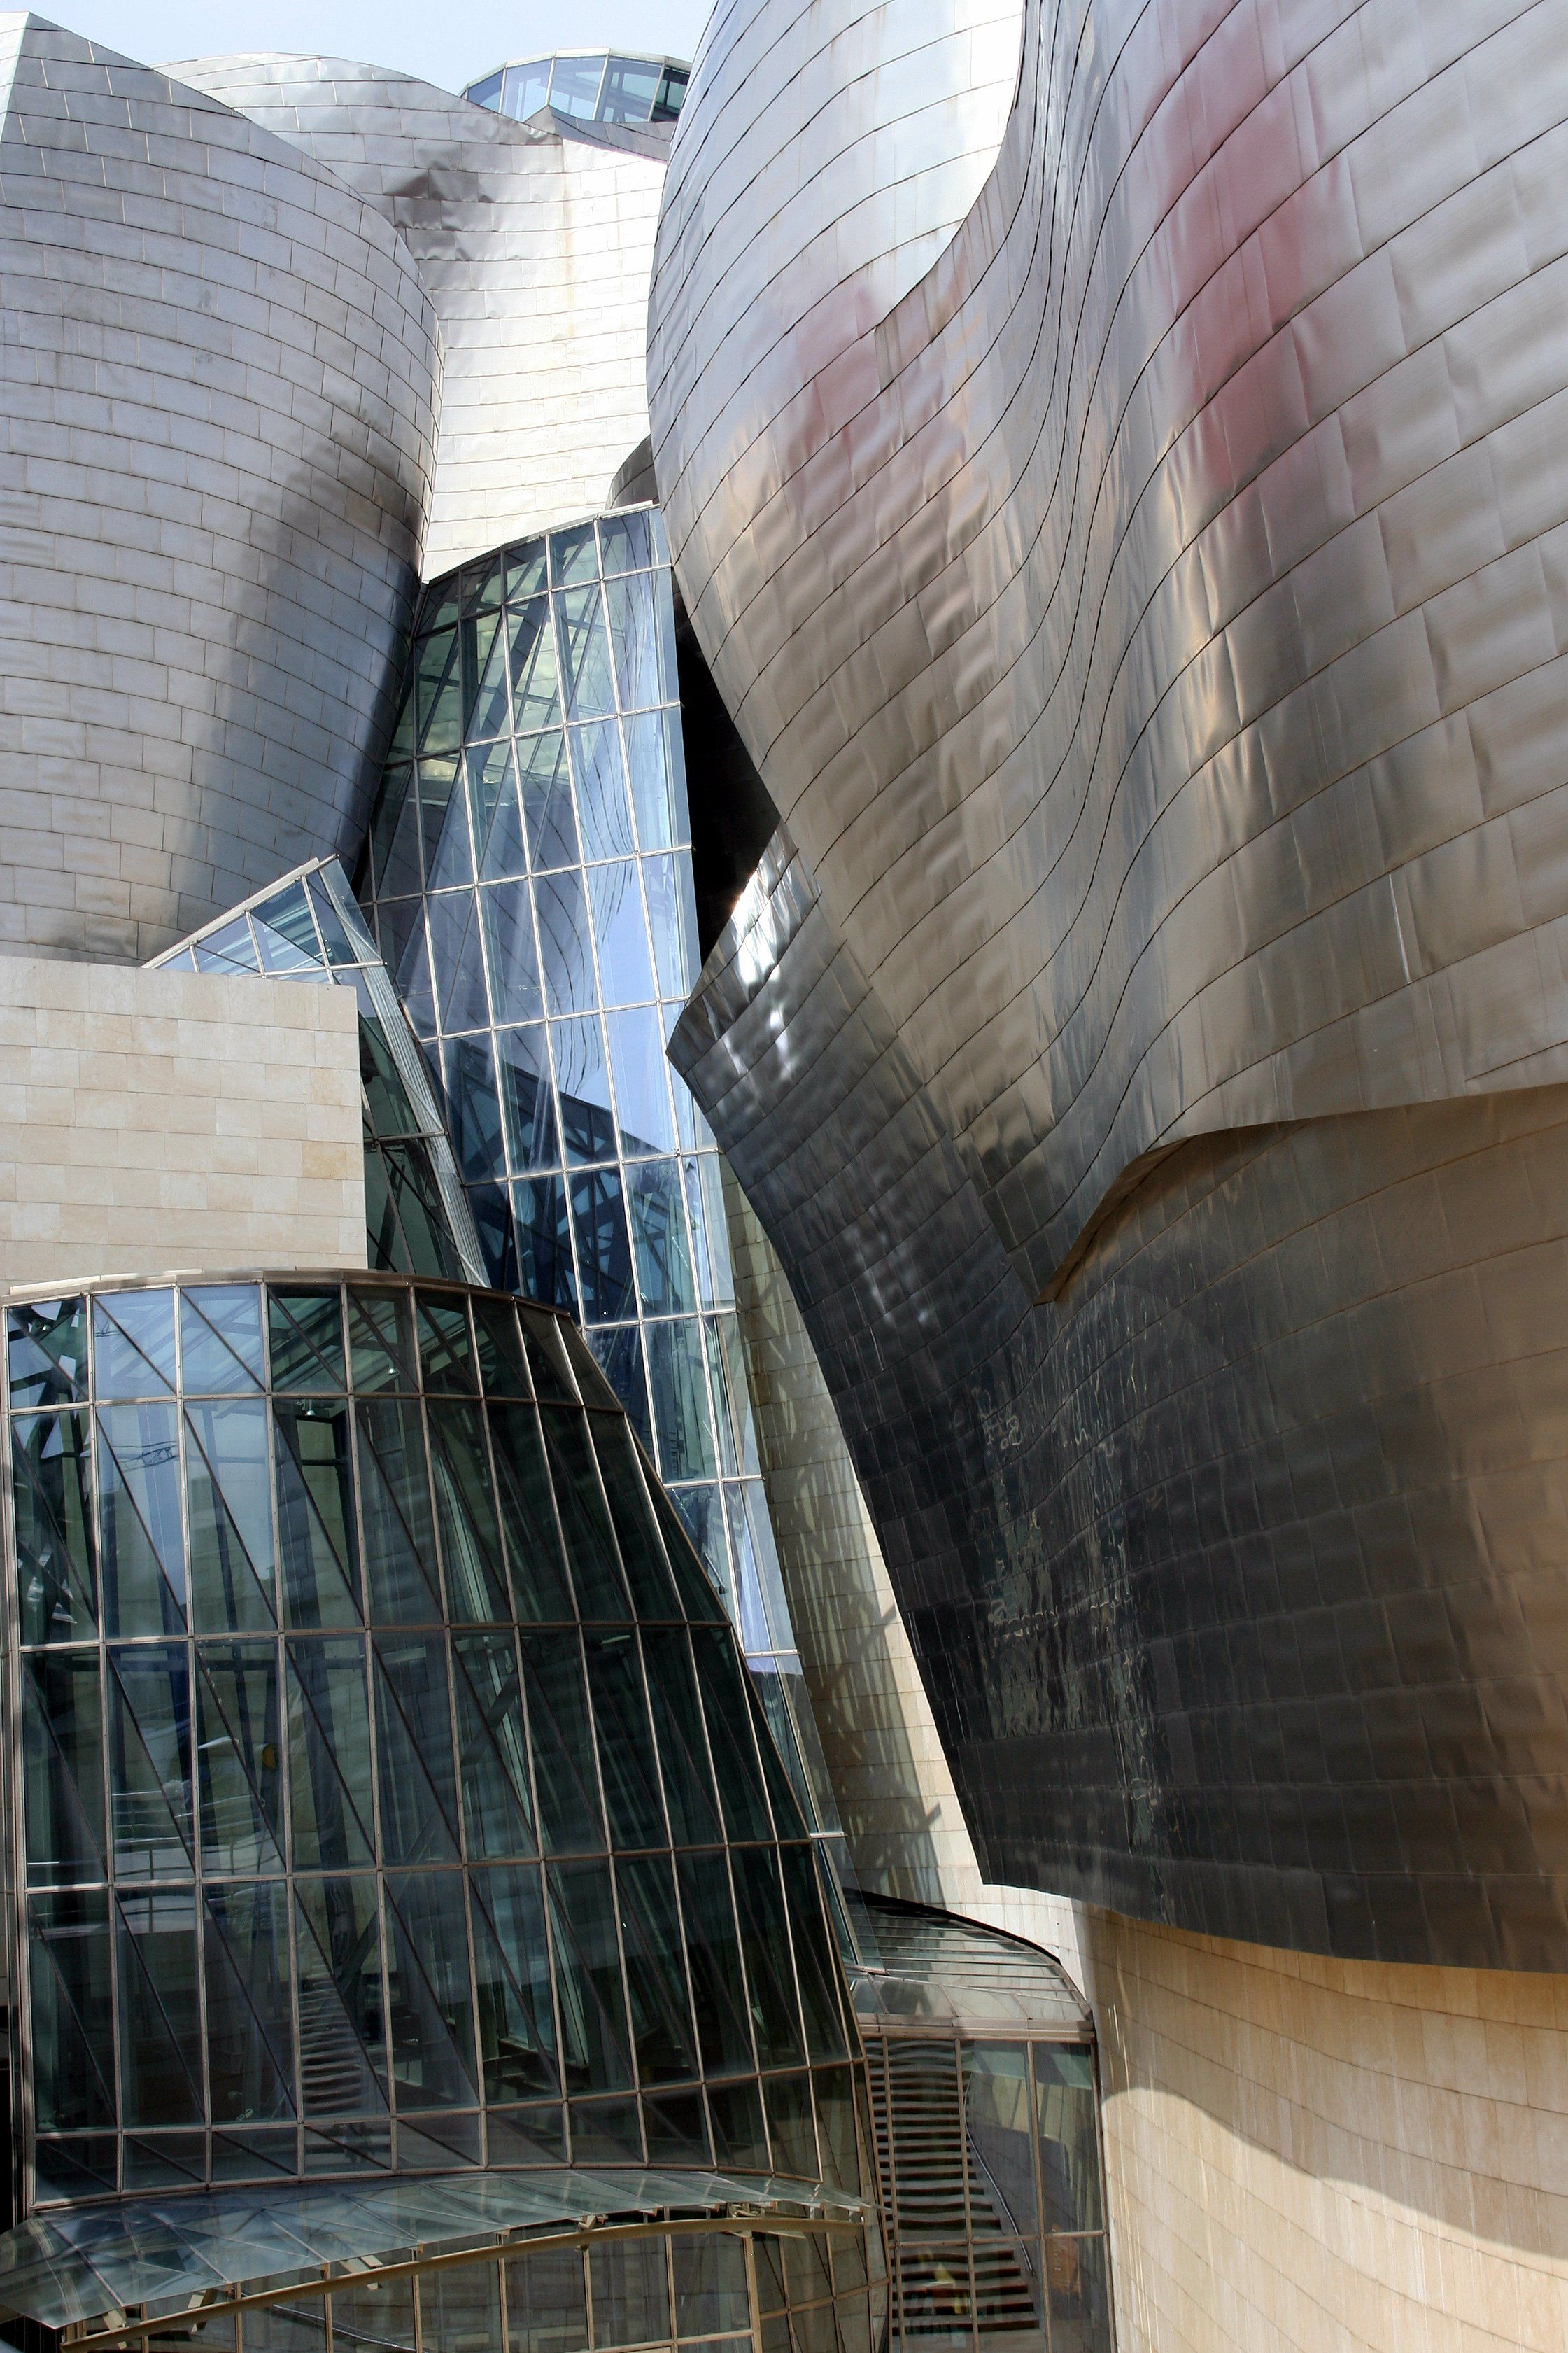 Artworks Photos In The Guggenheim Art Of Bilbao Spain Google